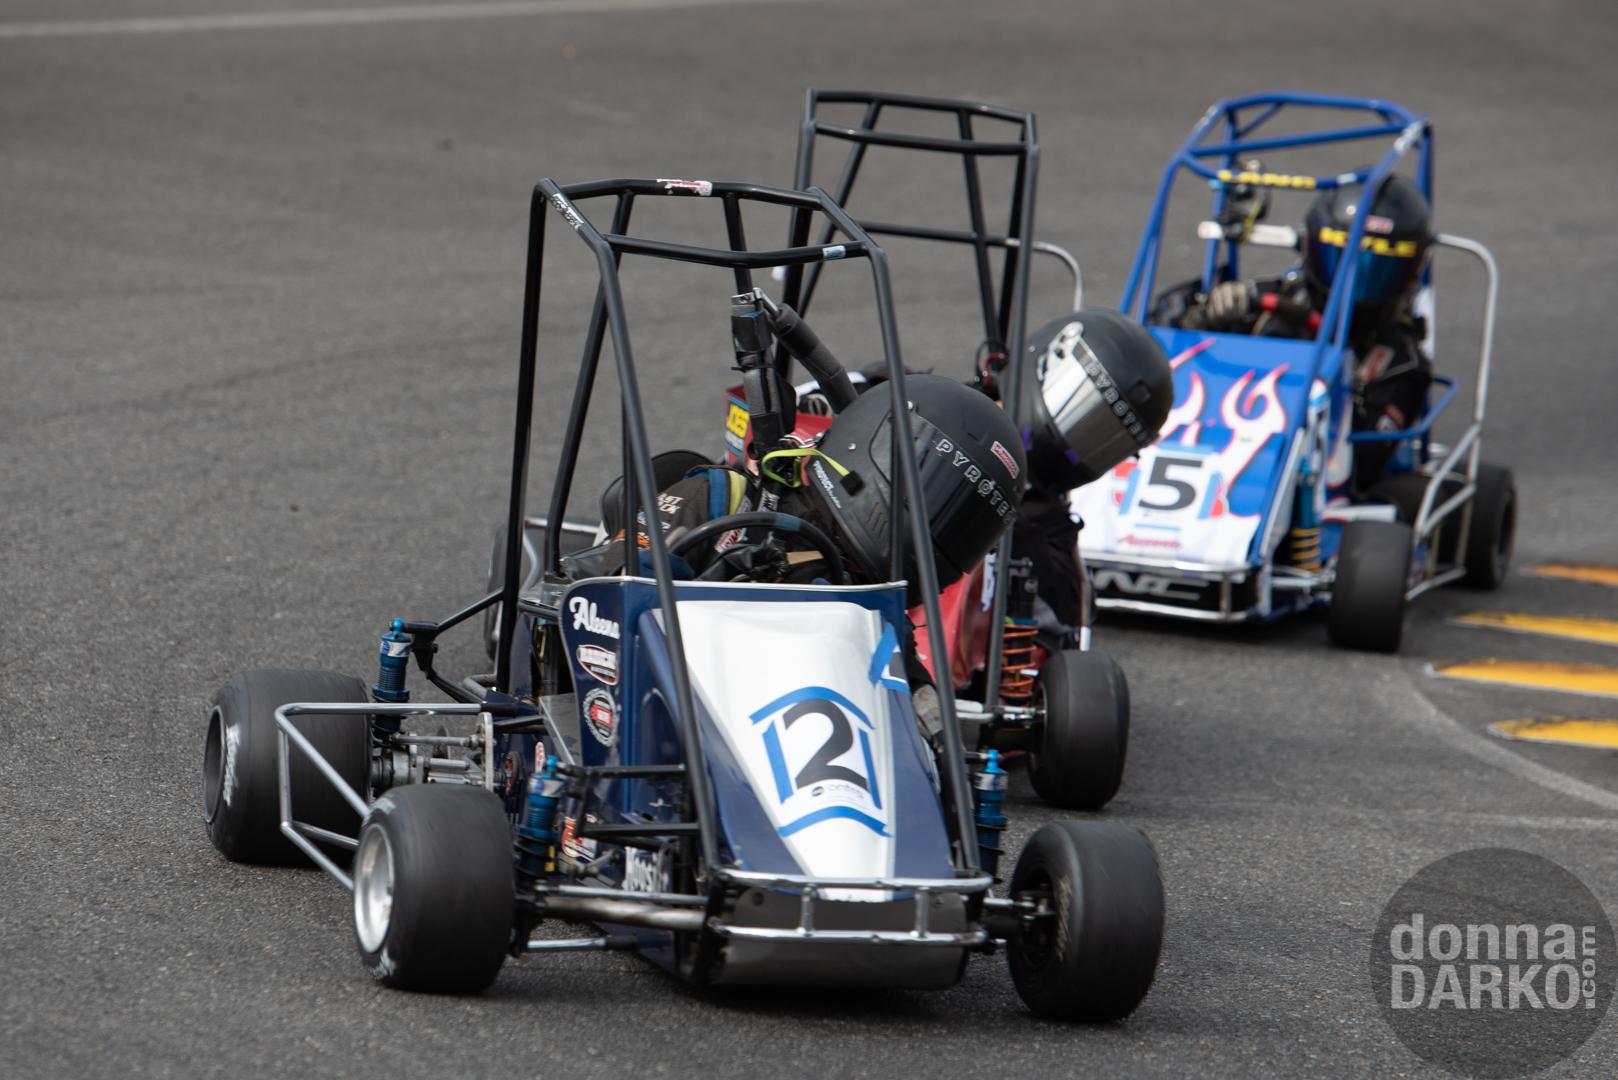 QWMA (Racing) 8-11-2019 DSC_7808.jpg